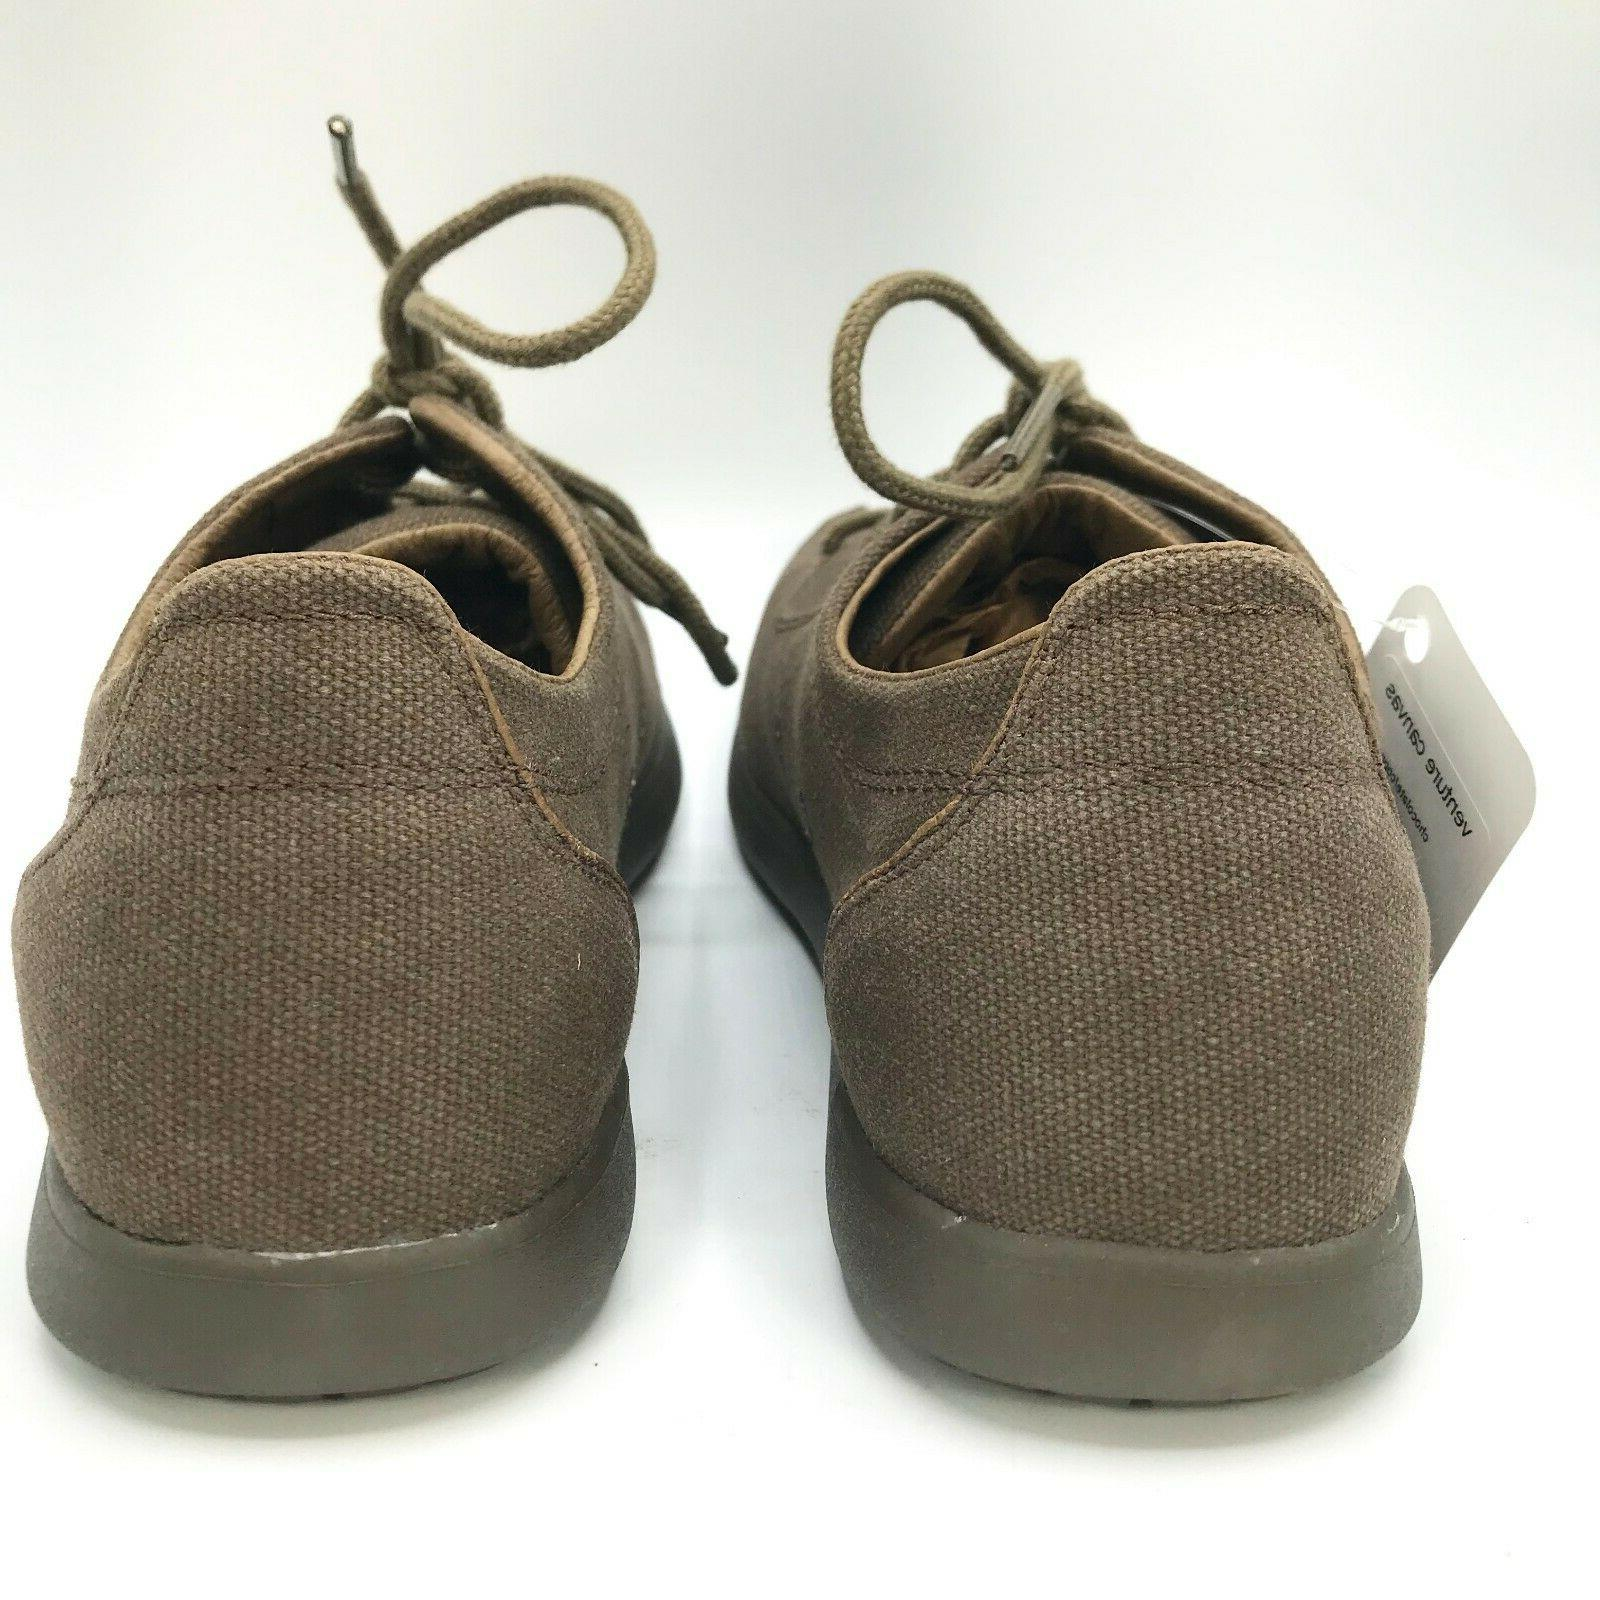 CROCS Canvas Chocolate Up Shoe 8